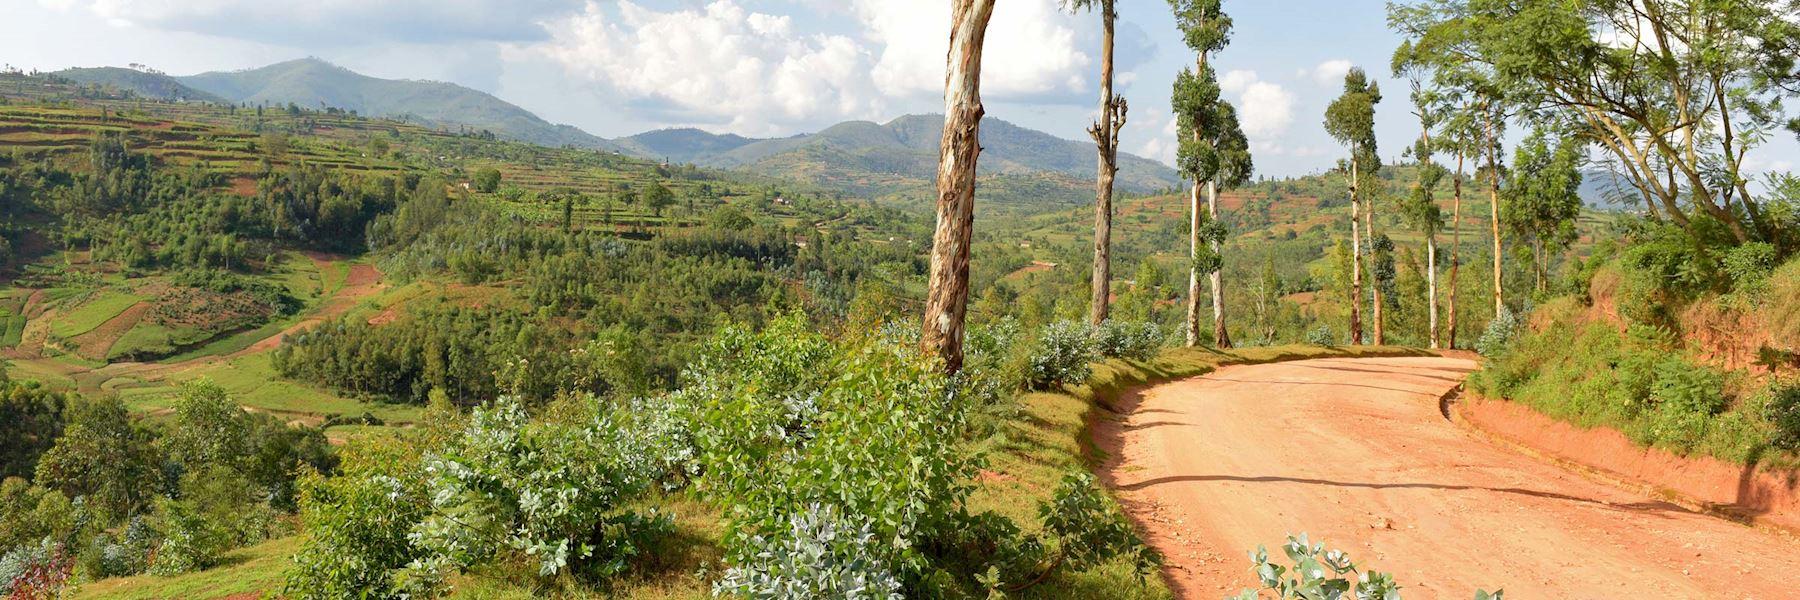 Visit Butare, Rwanda